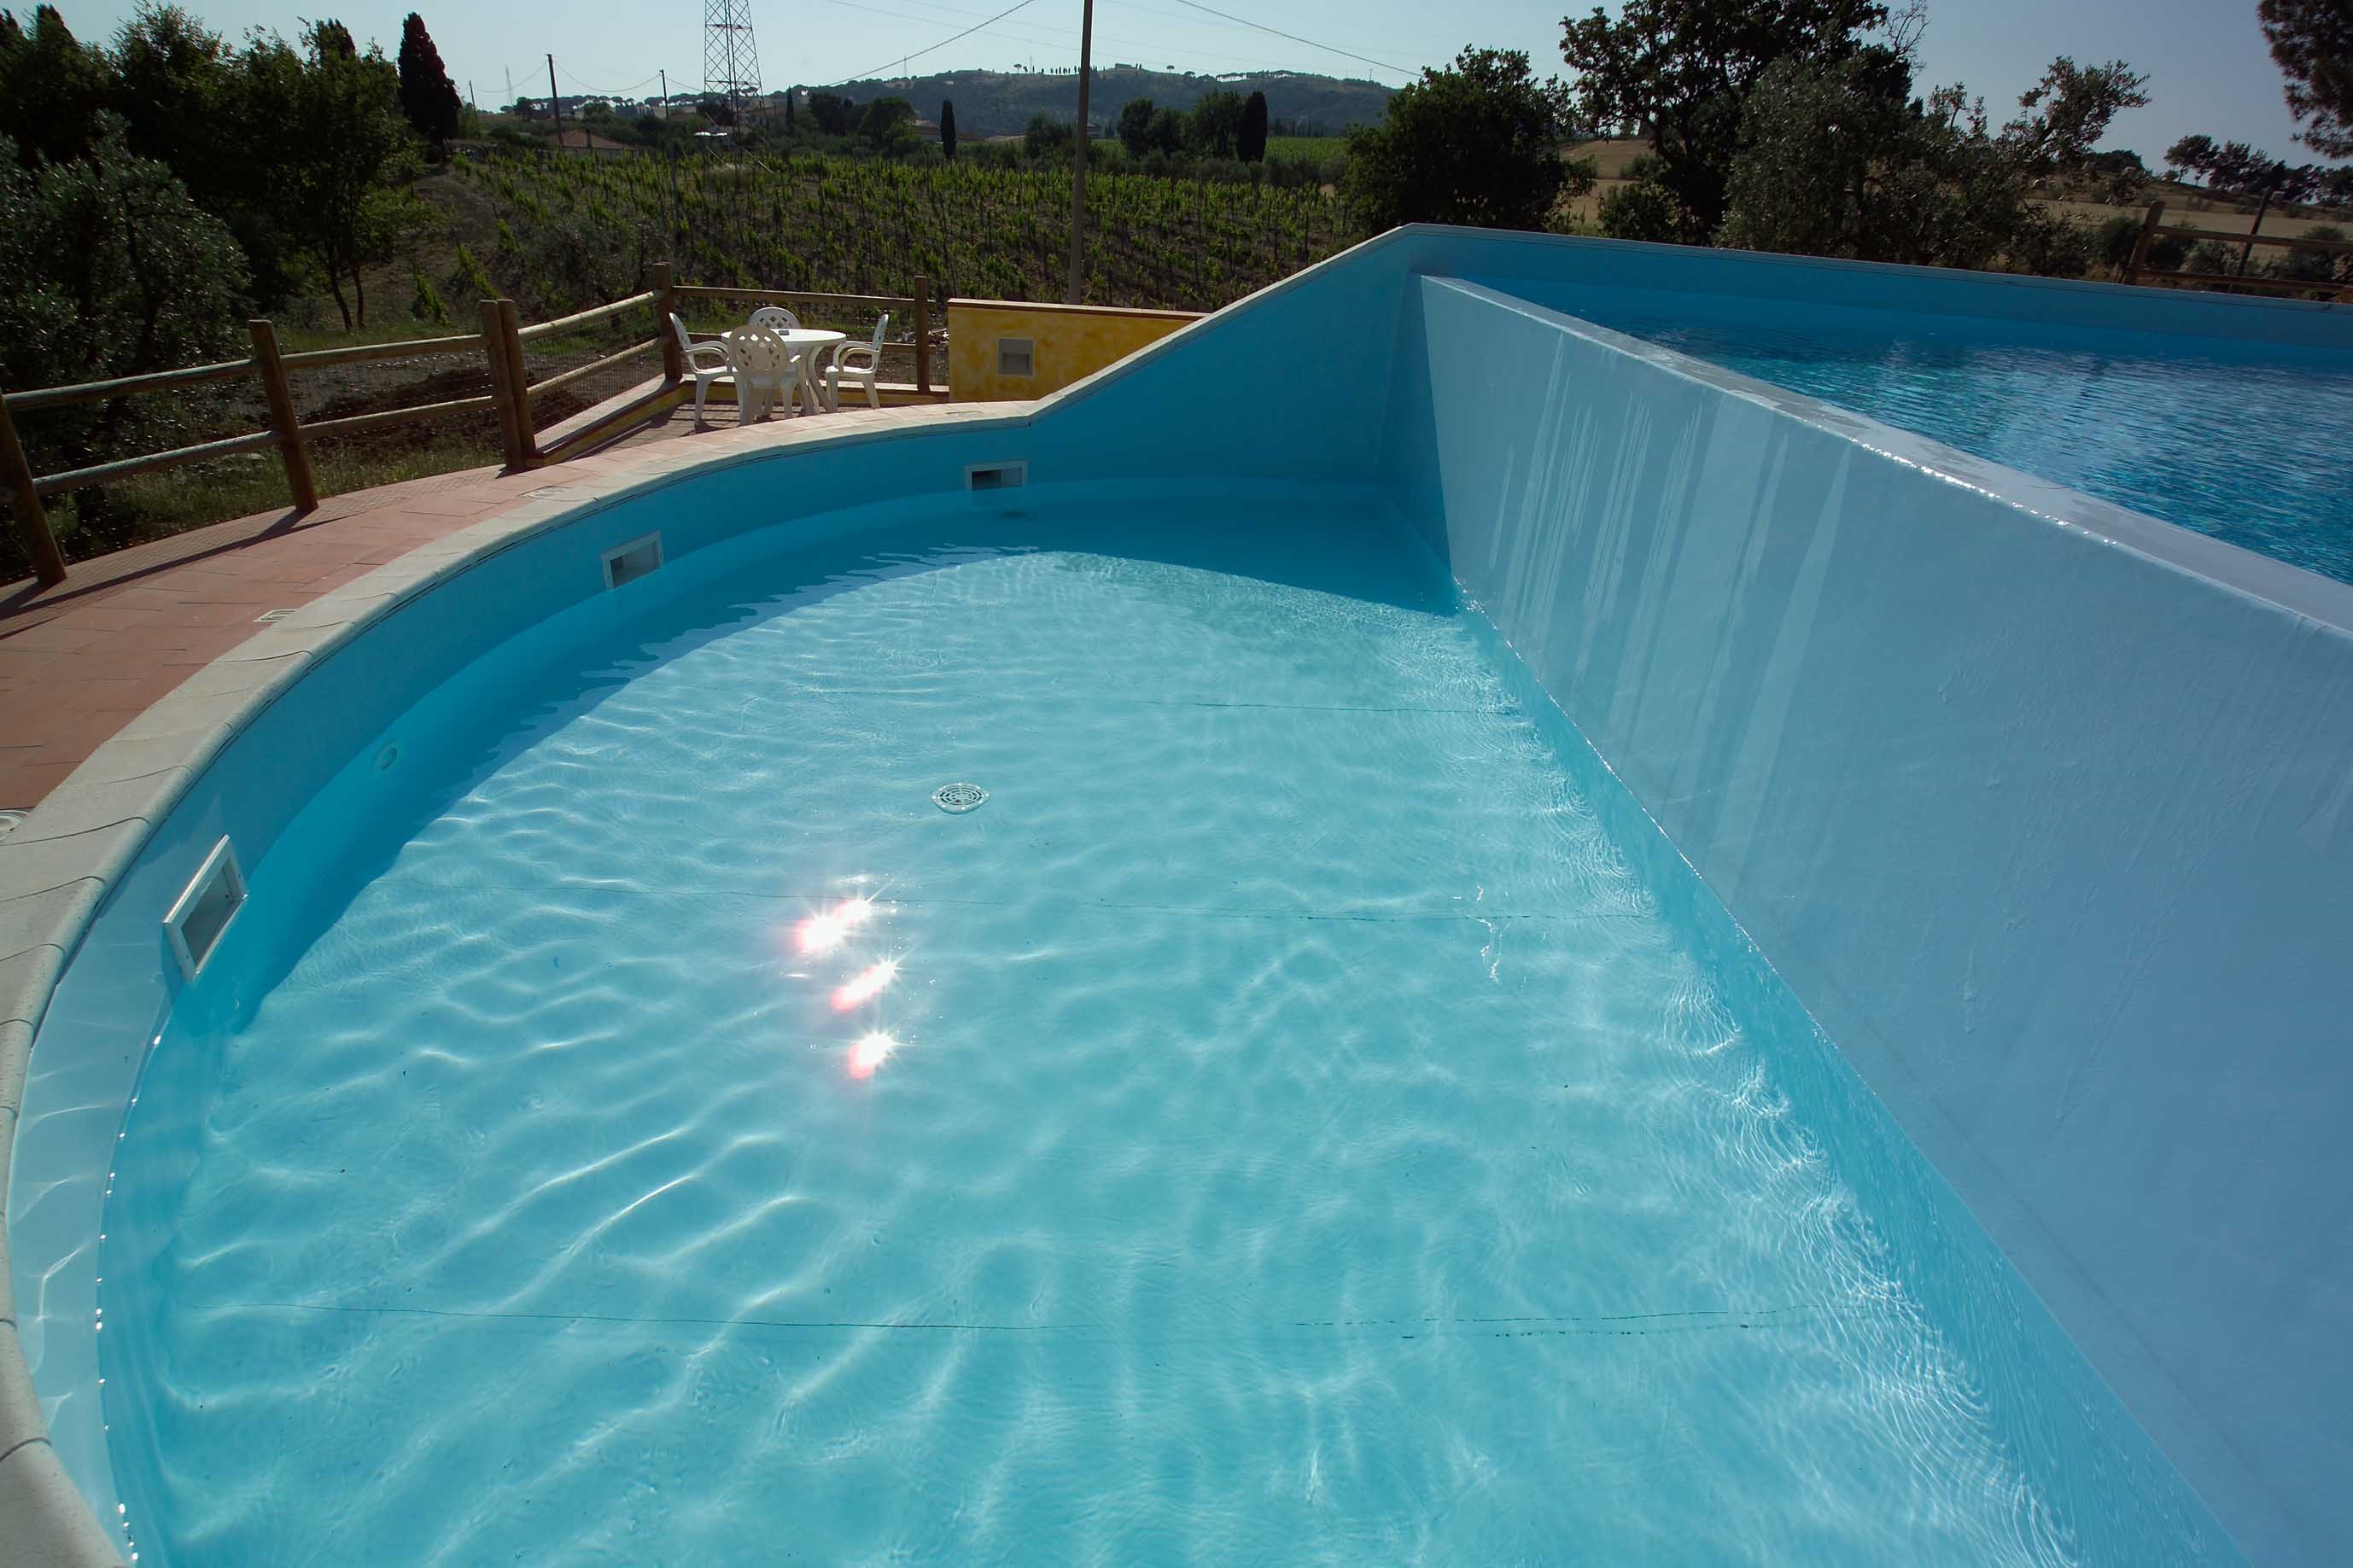 Vendita Piscine A Catania piscina su due livelli